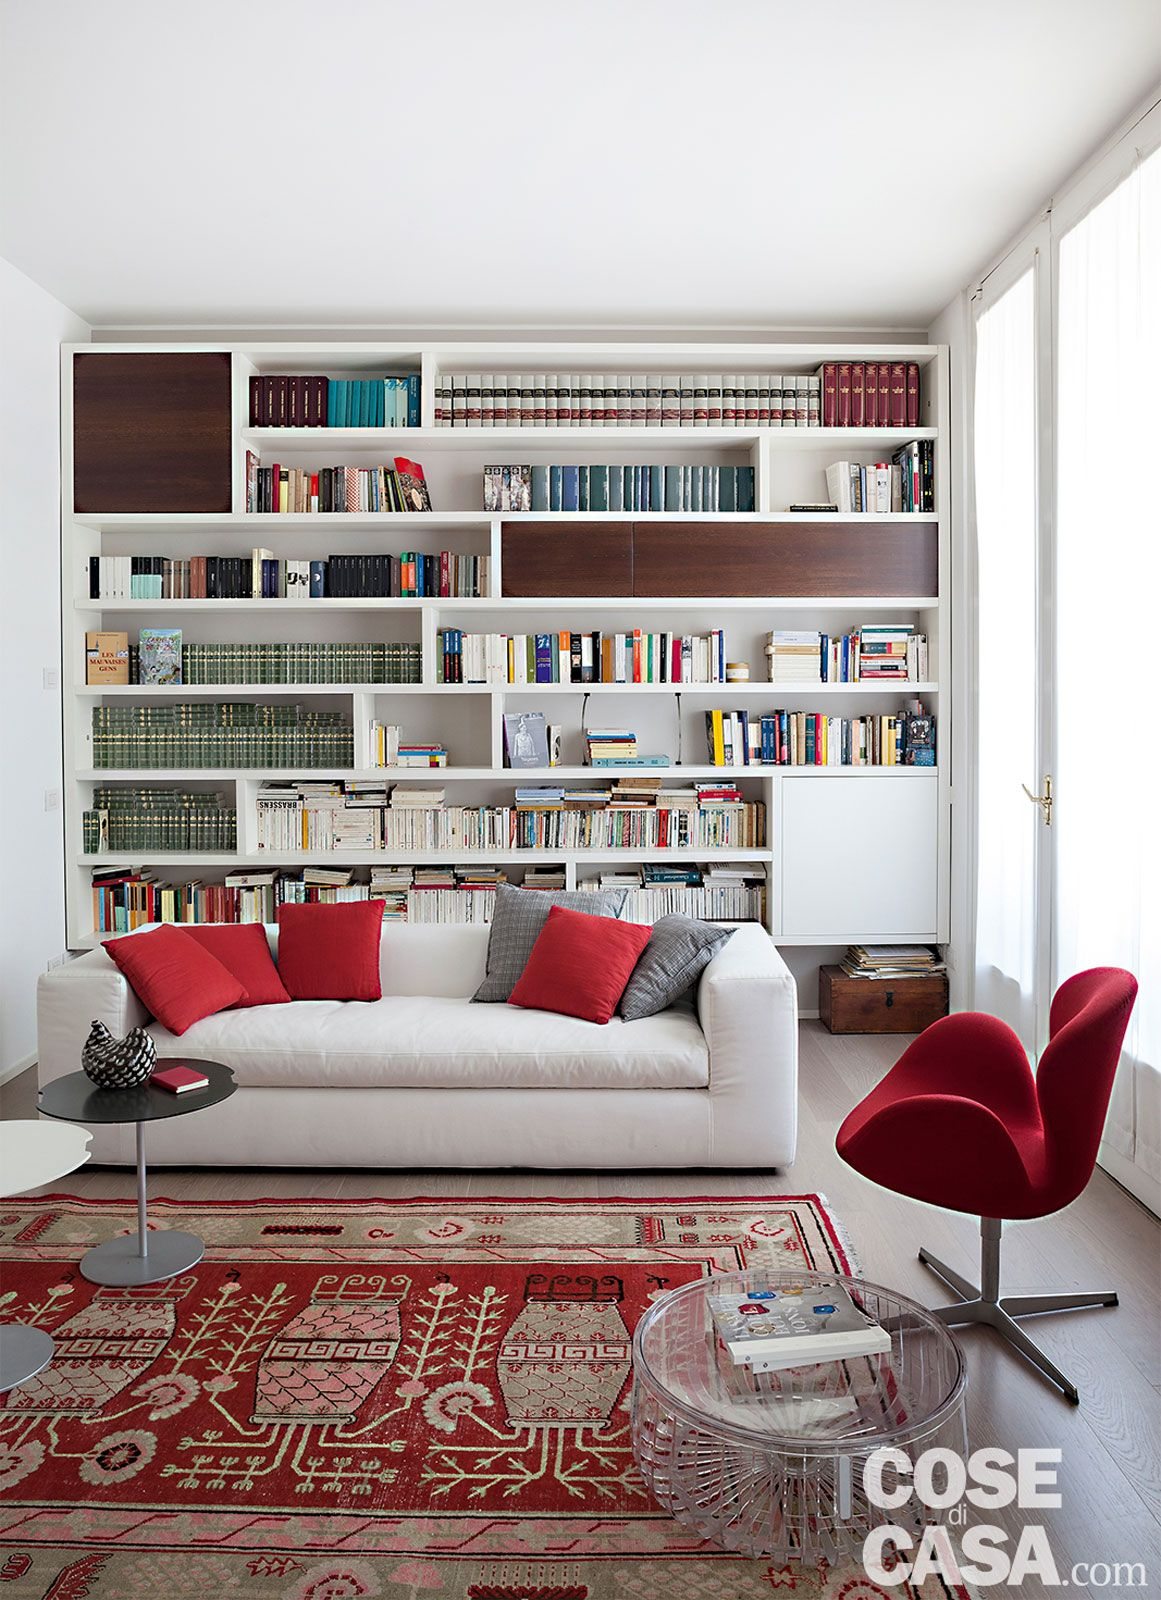 50 mq: una casa open space per avere più luce. Guarda i ...